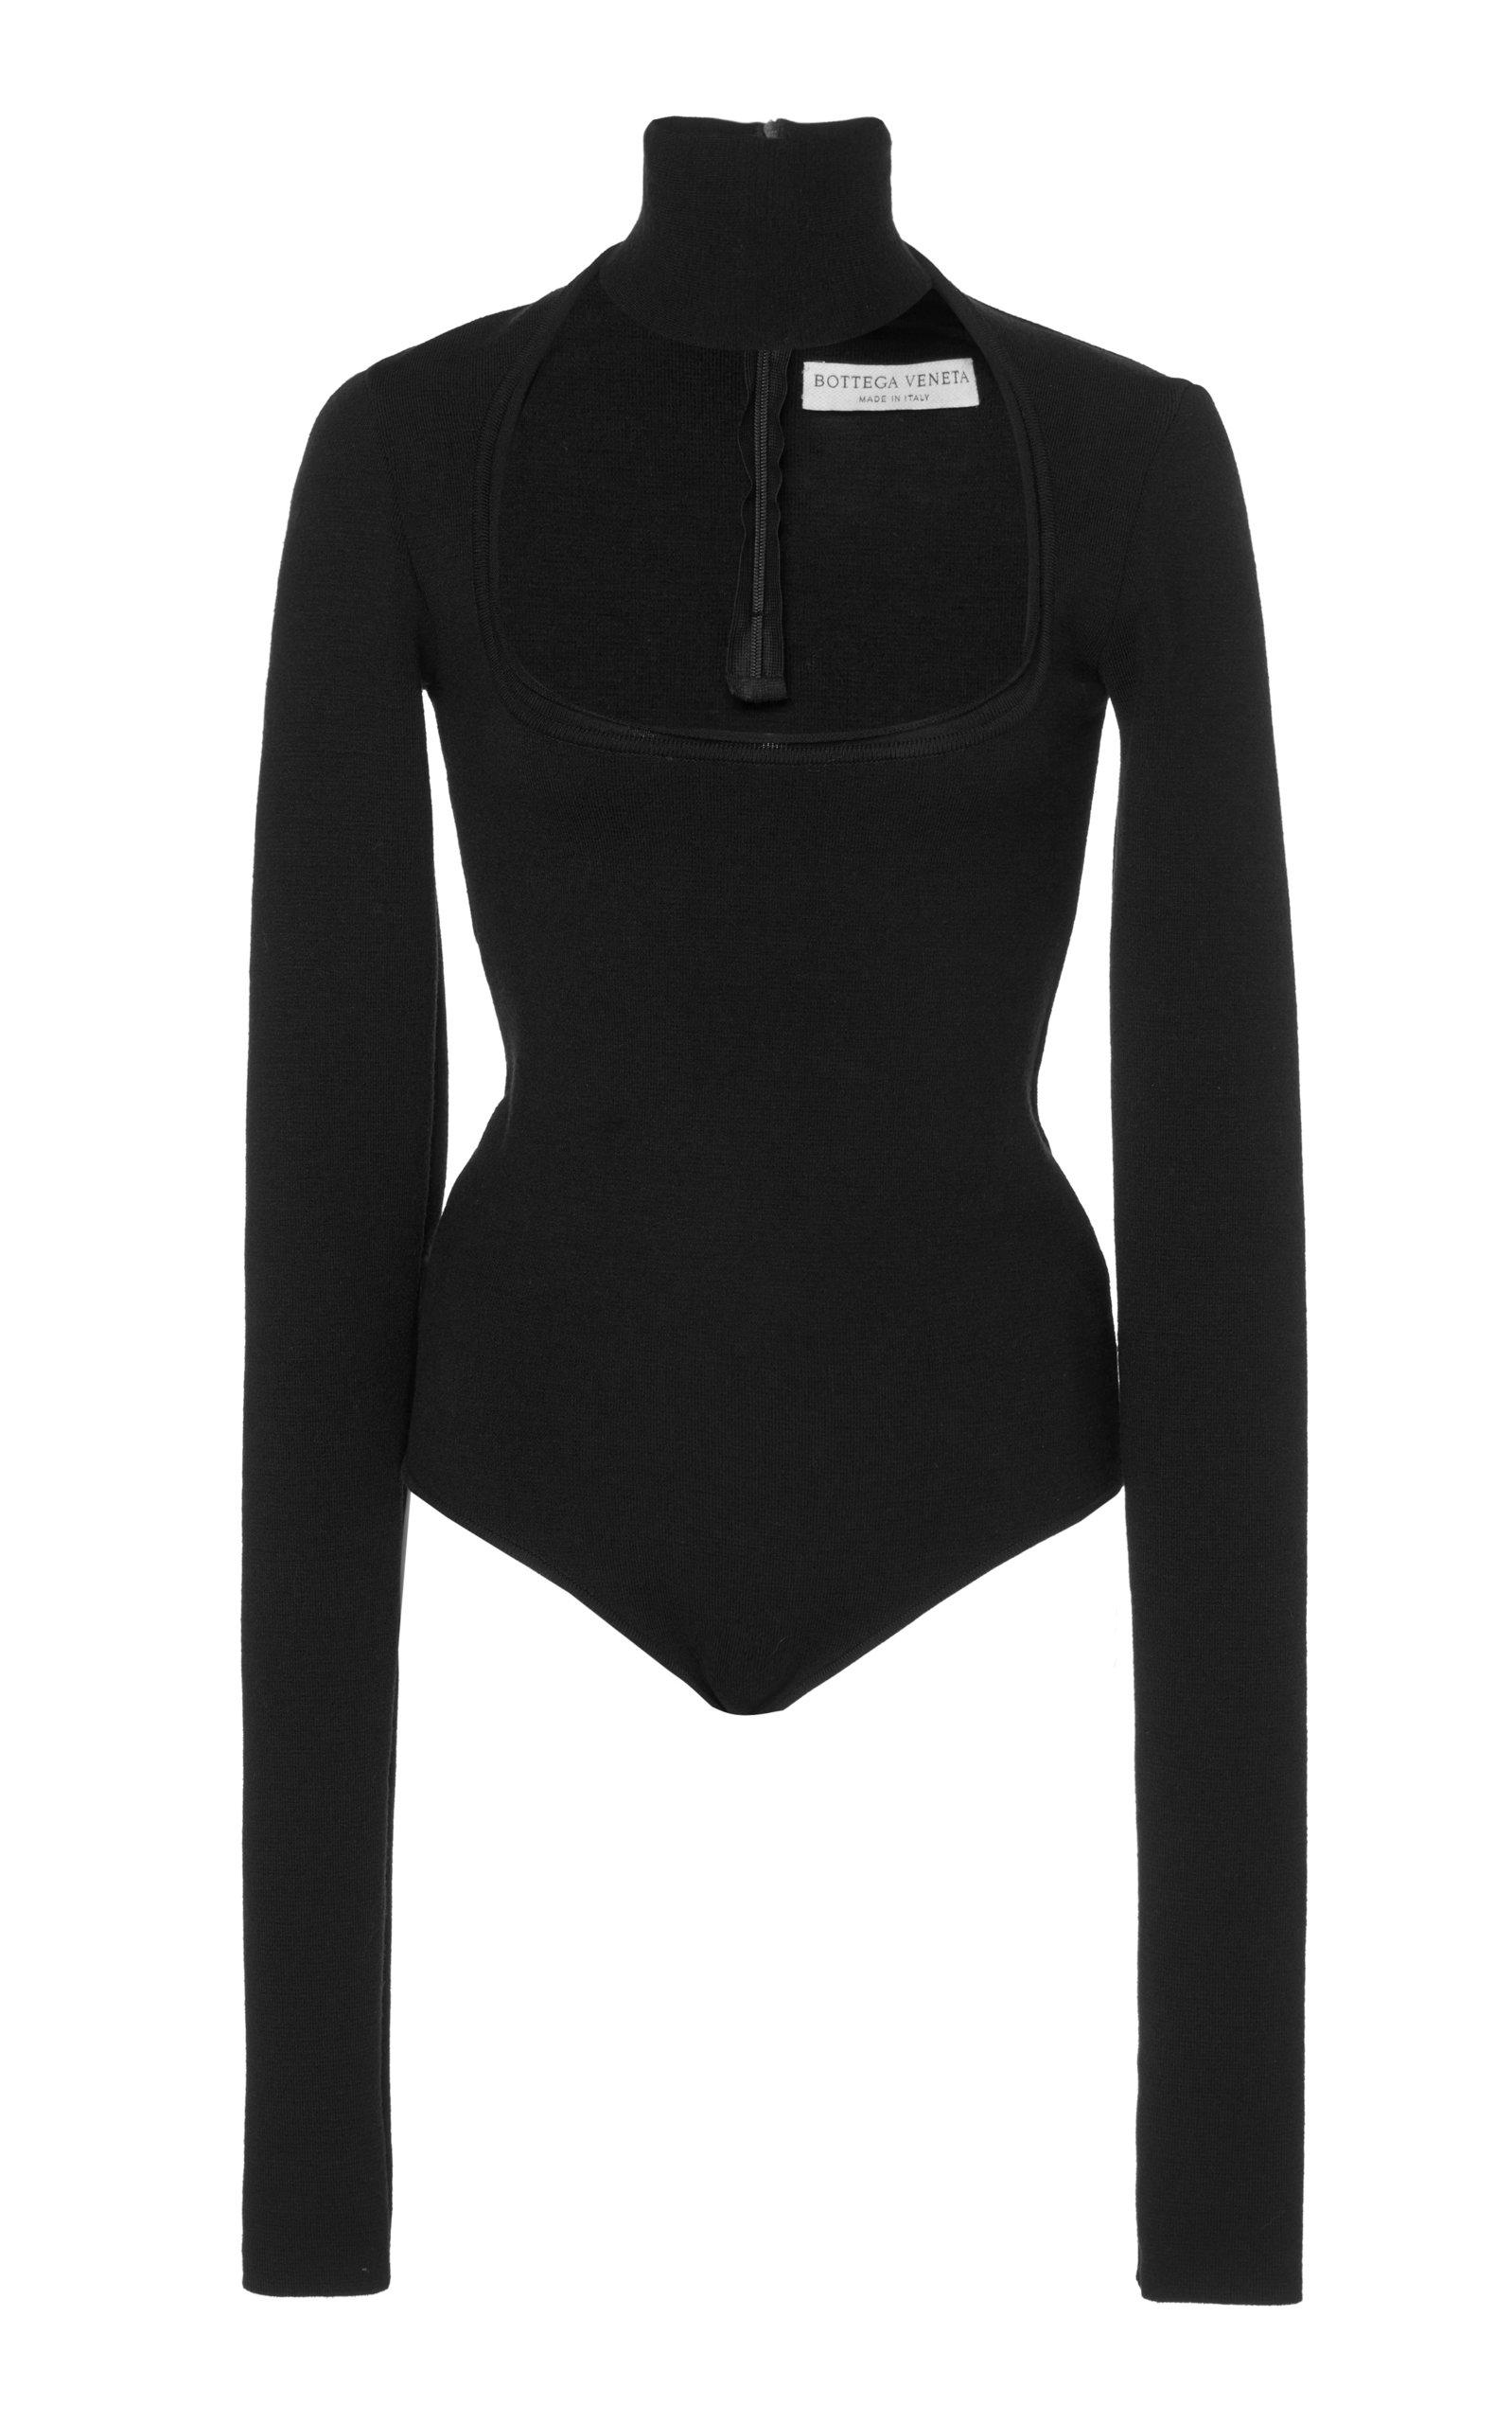 BOTTEGA VENETA Cutout Turtleneck Stretch-Wool Crepe Bodysuit